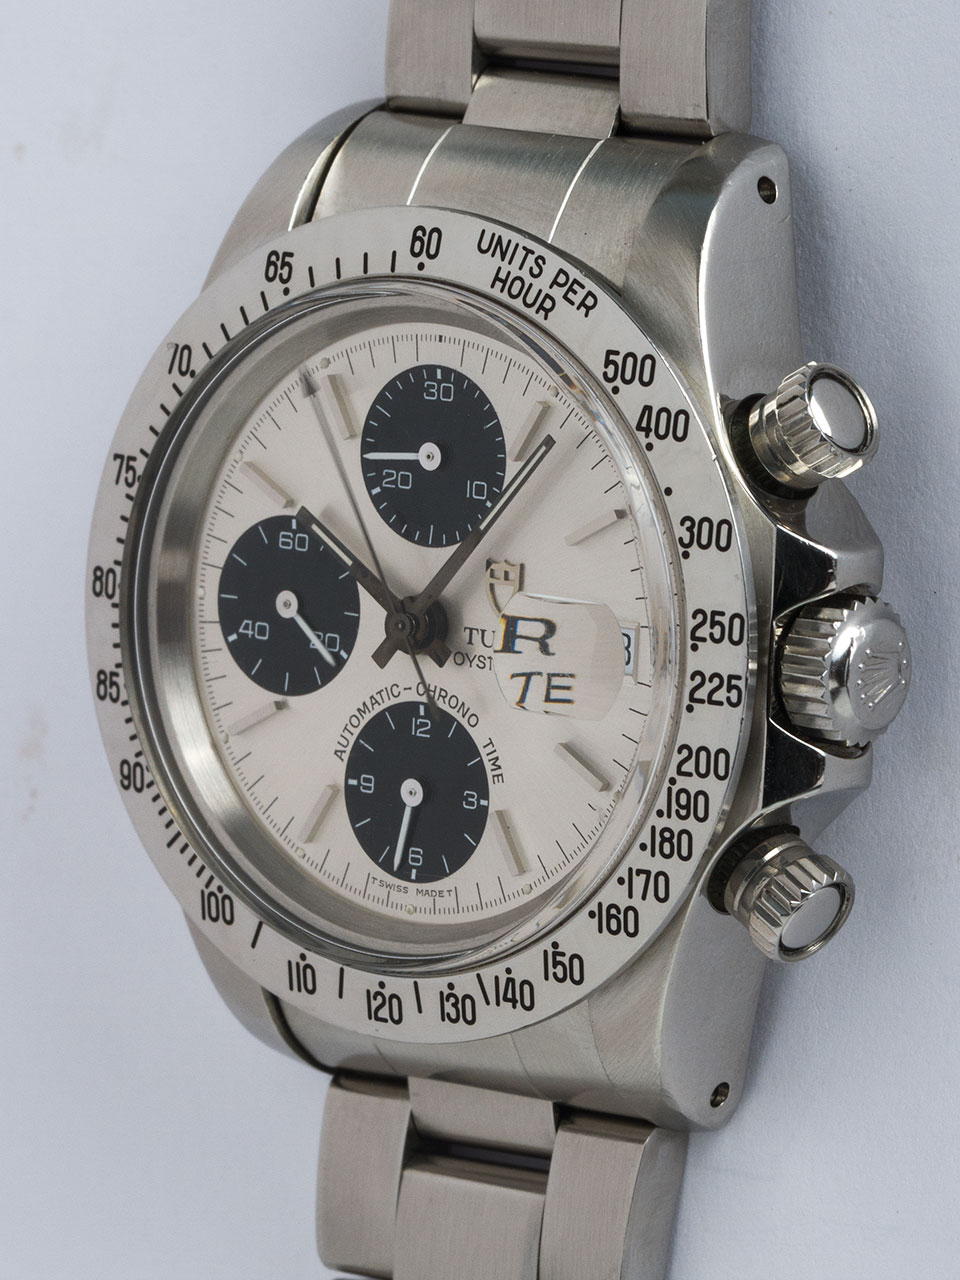 Tudor SS Oyster Date Chronograph ref # 79180 circa 1980s